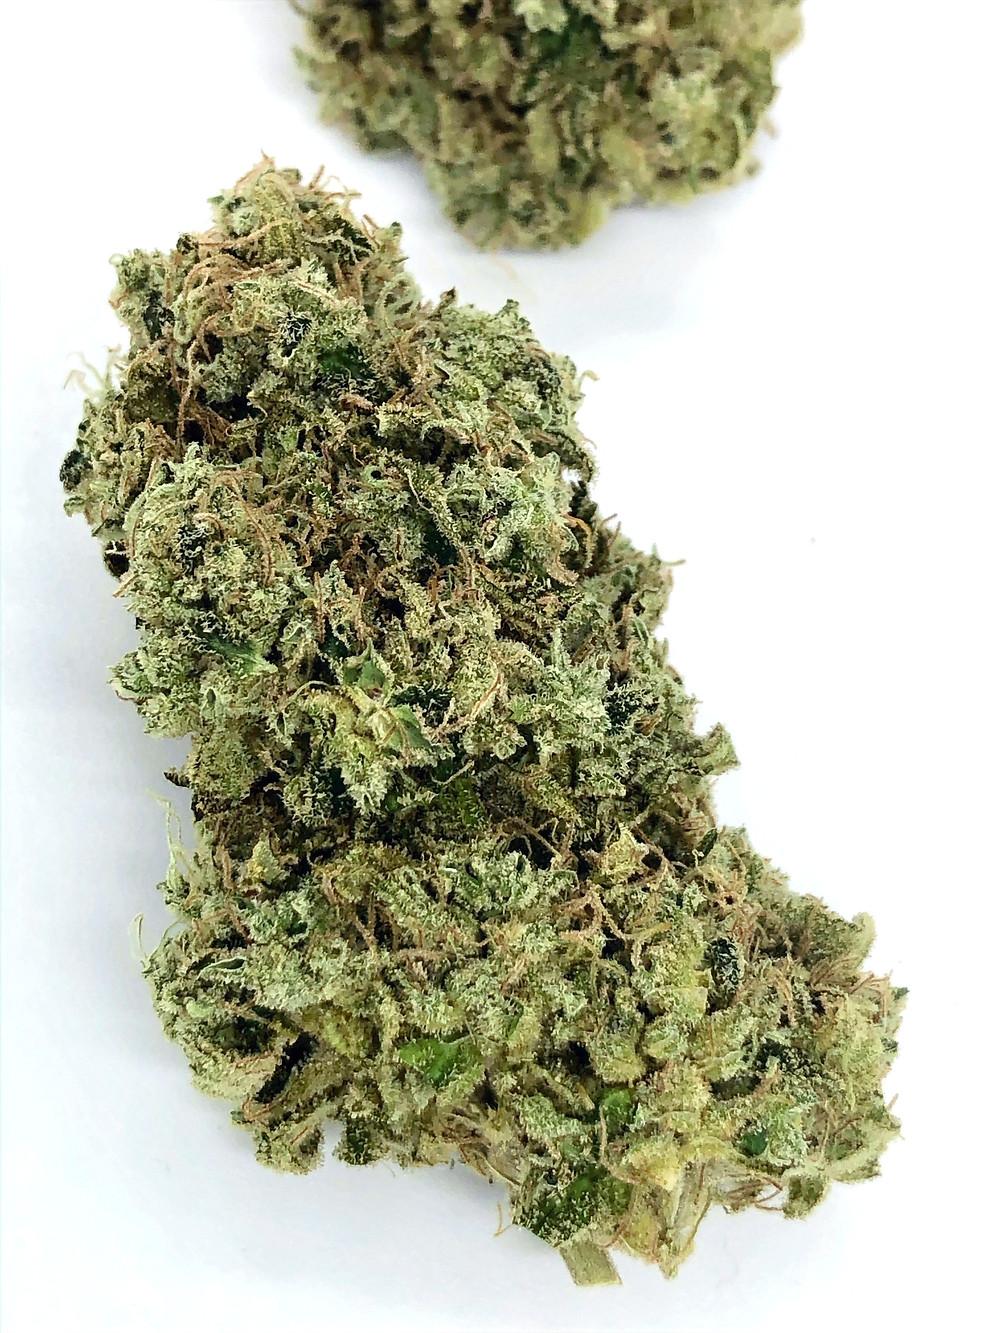 lemon-skunk-herbal-alternatives-dc-review-2